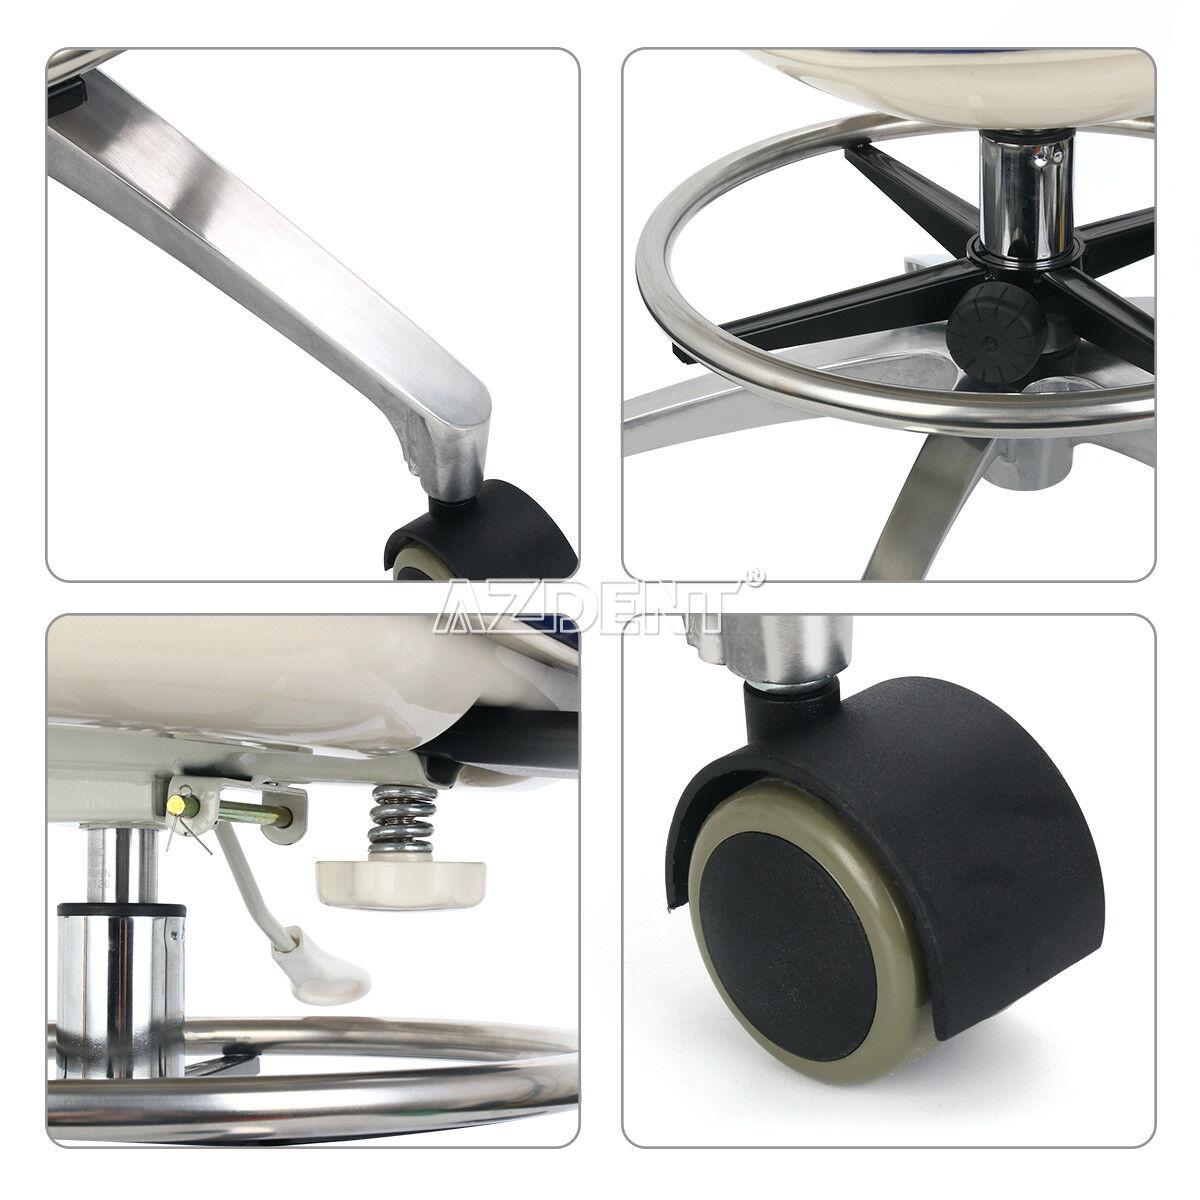 Dental Dentist Chair PU Leather Adjustable Stool Hydraulic Rolling Stool UPS - $139.99